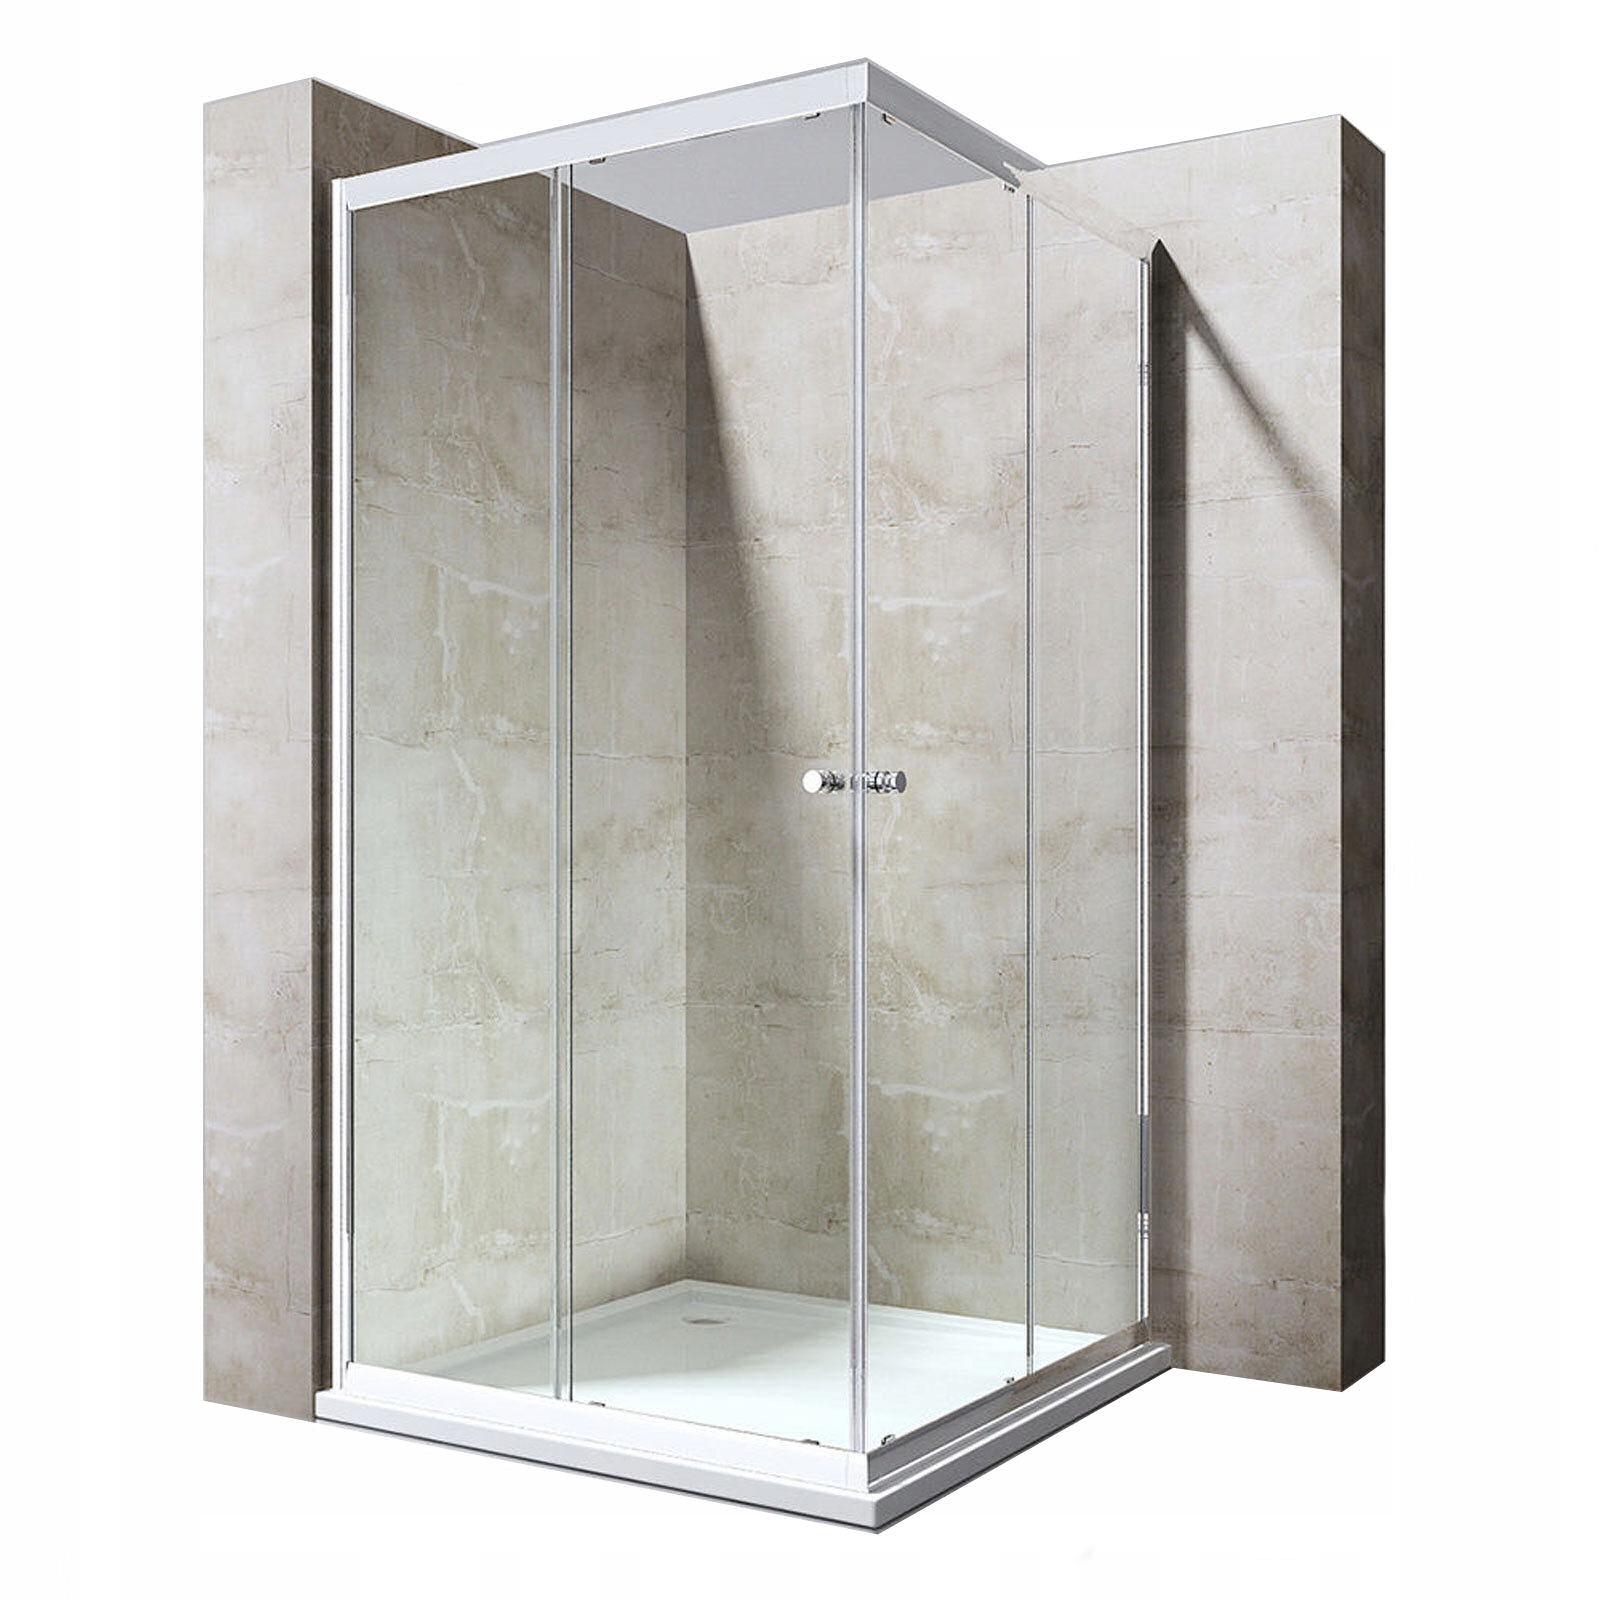 Sprcha priestoru eco Swiss 90x80